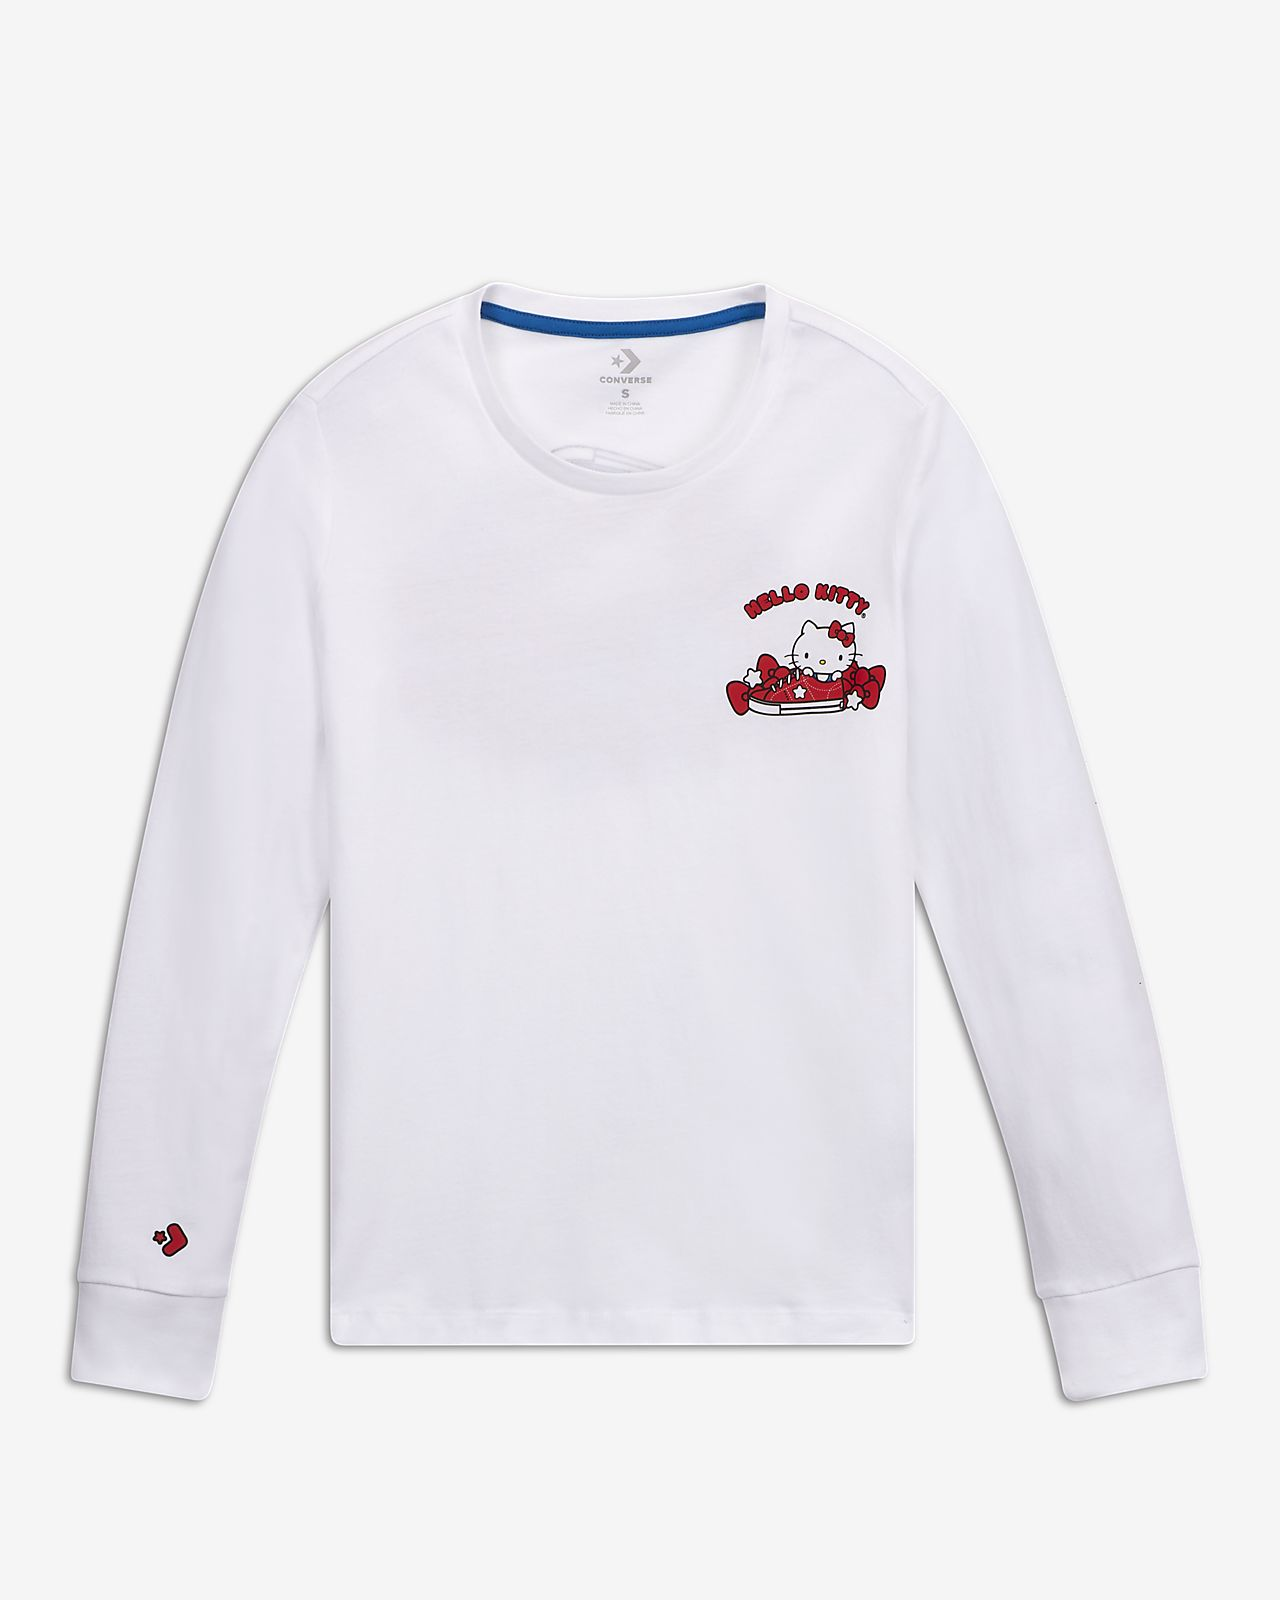 Converse x Hello Kitty Shoe Pile Women's Long-Sleeve T-Shirt